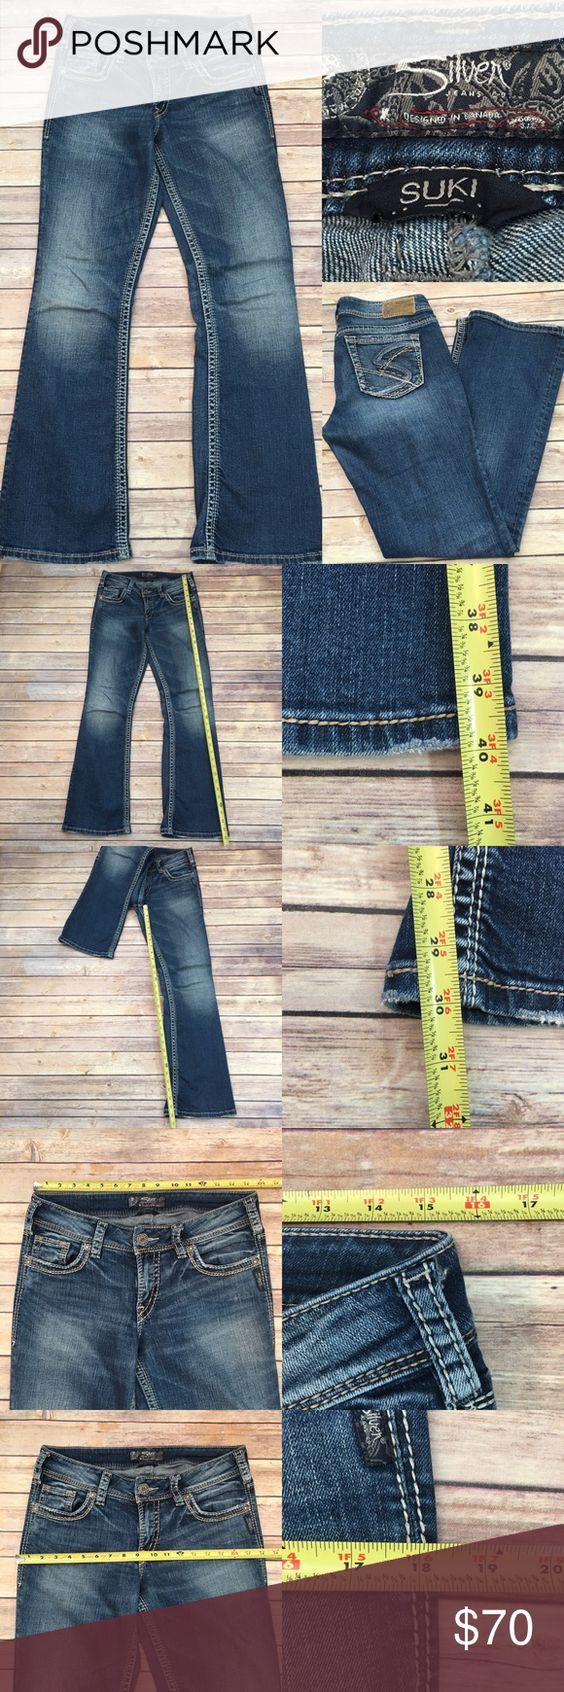 💌Sz 29 Silver Jeans Suki Bootcut Distressed Jeans